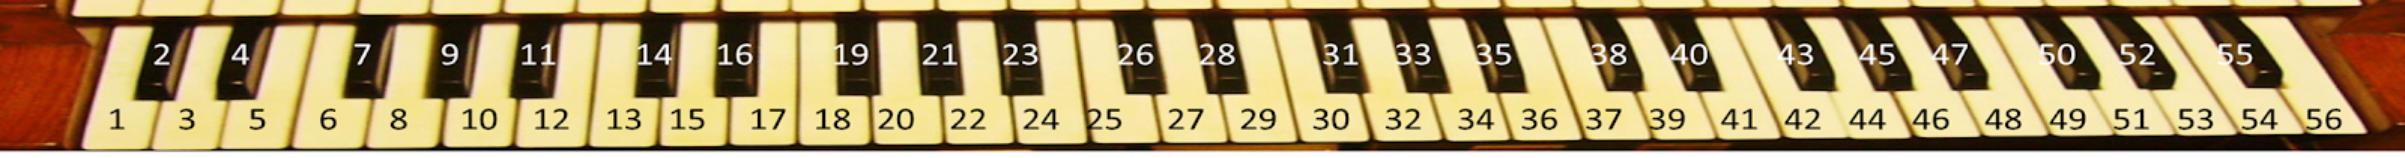 clavier numéroté